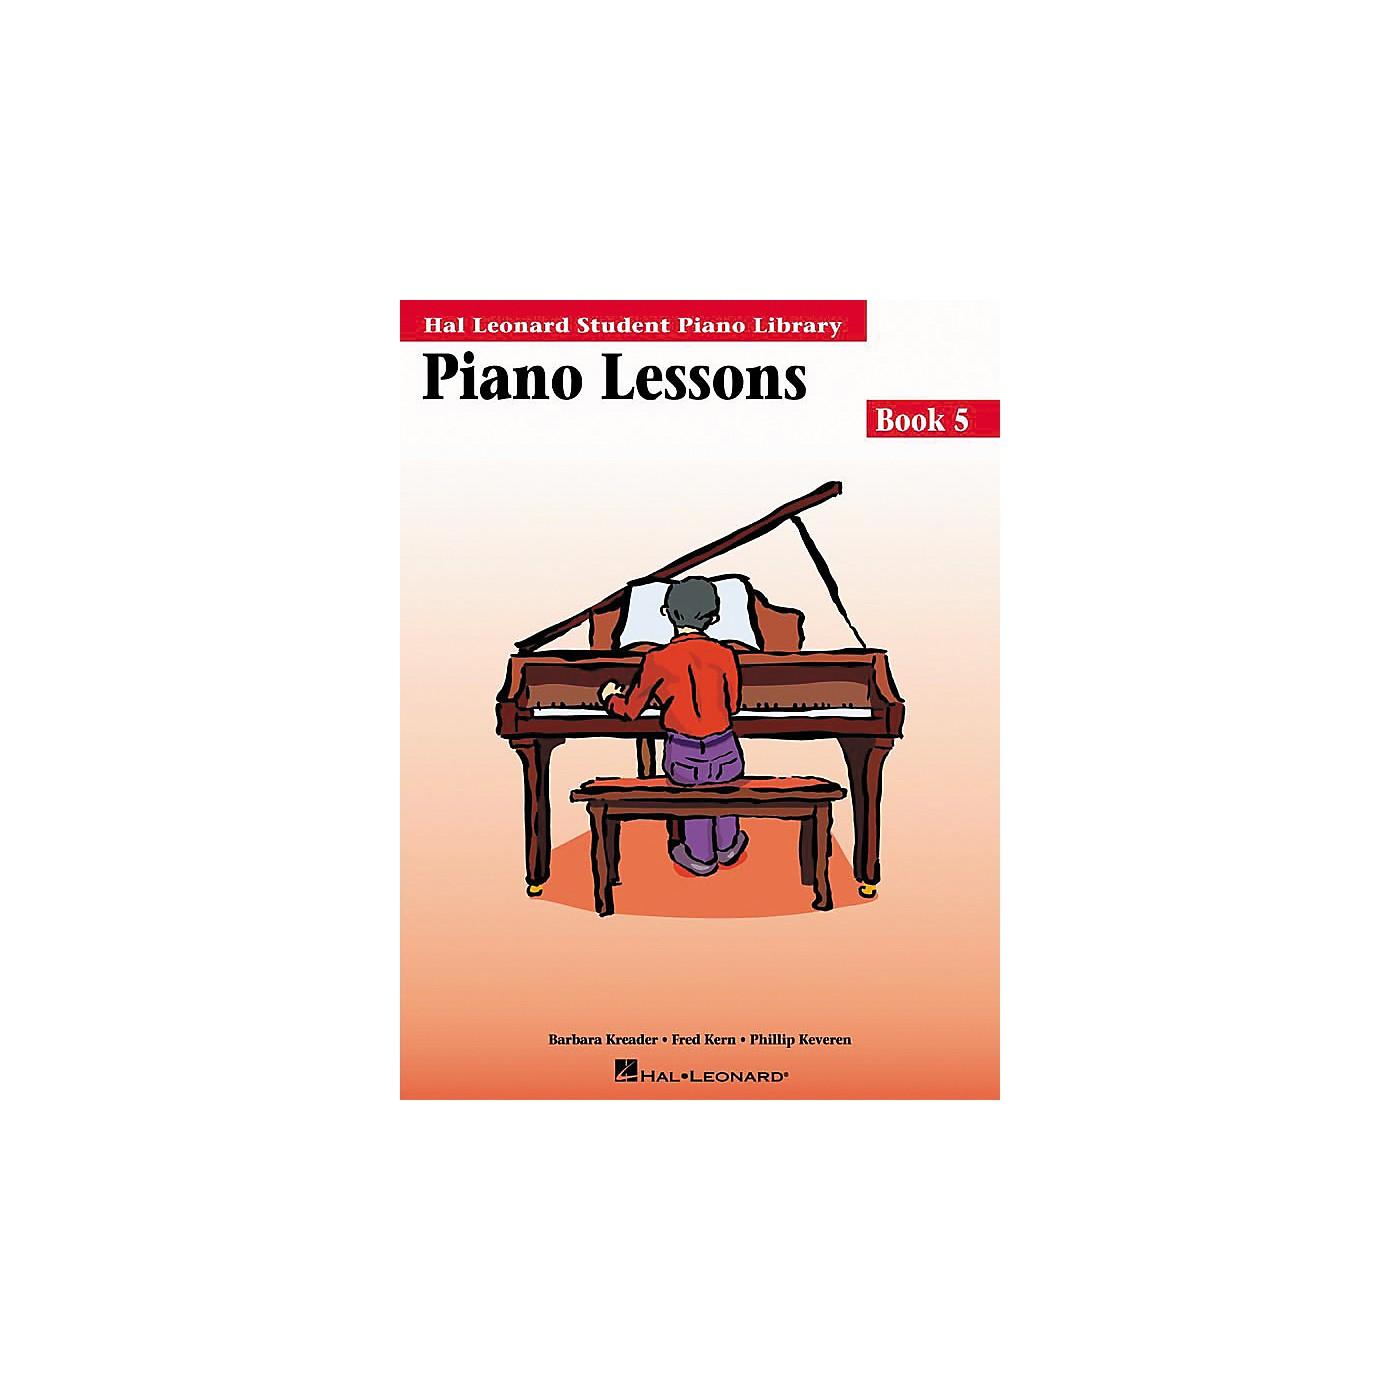 Hal Leonard Piano Lessons Book 5 Hal Leonard Student Piano Library thumbnail